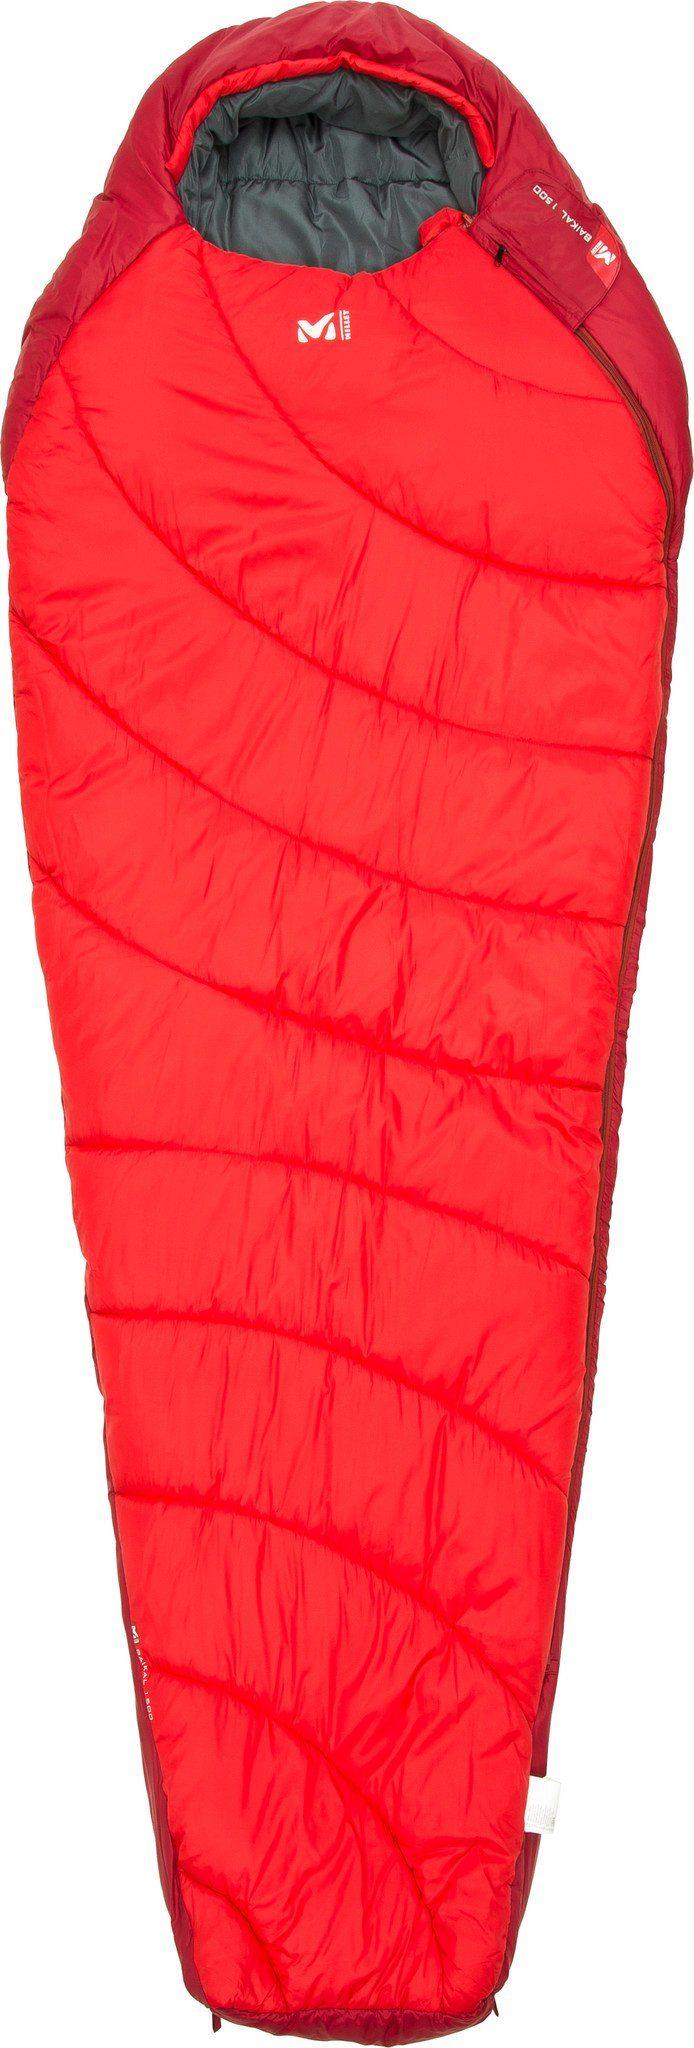 Millet Schlafsack »Baikal 1500 Long Sleeping Bag«